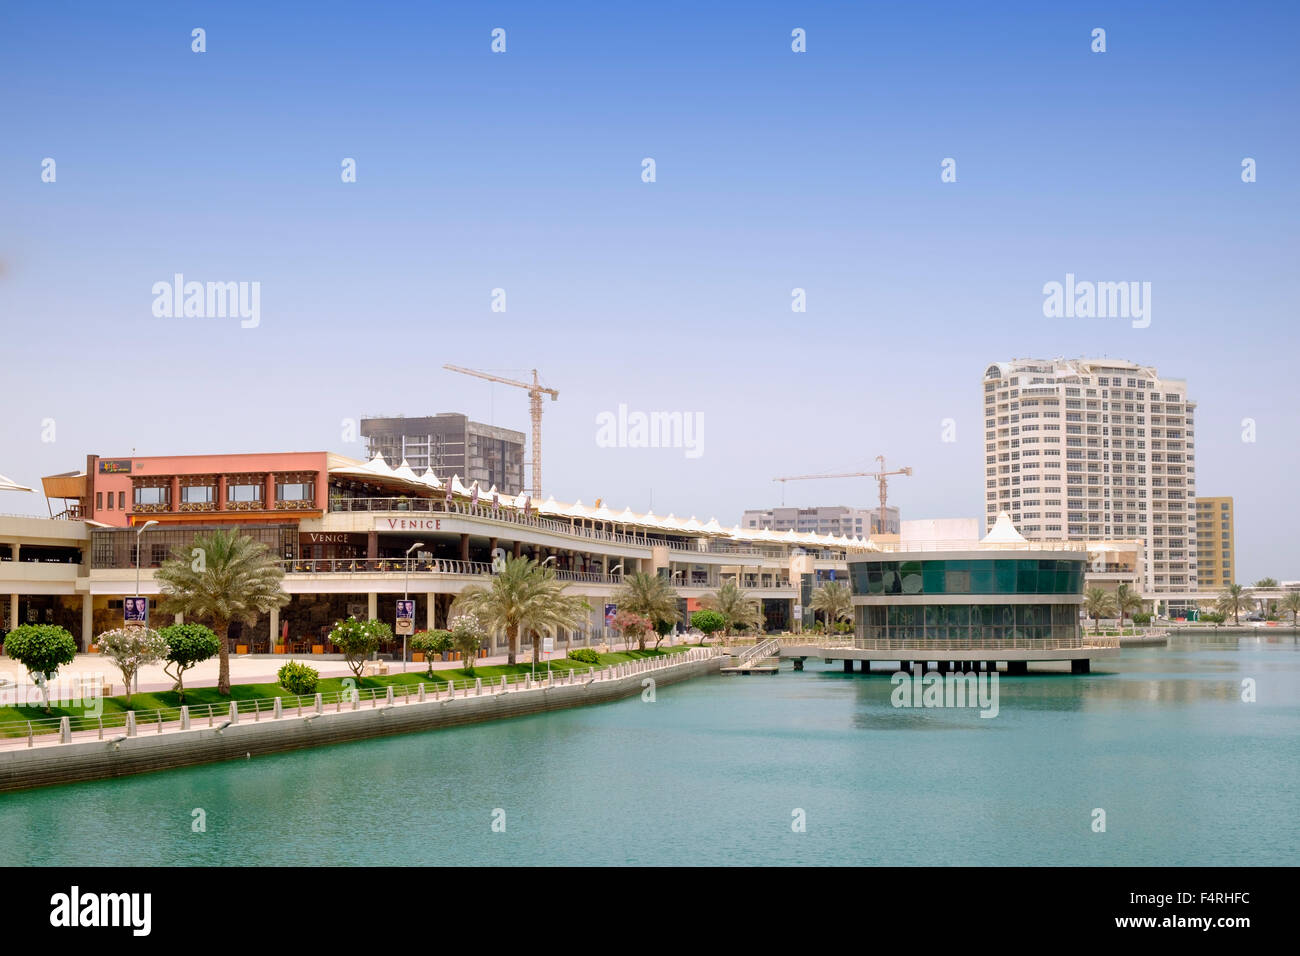 The Lagoon at new Amwaj Island residential property development in Kingdom of Bahrain - Stock Image